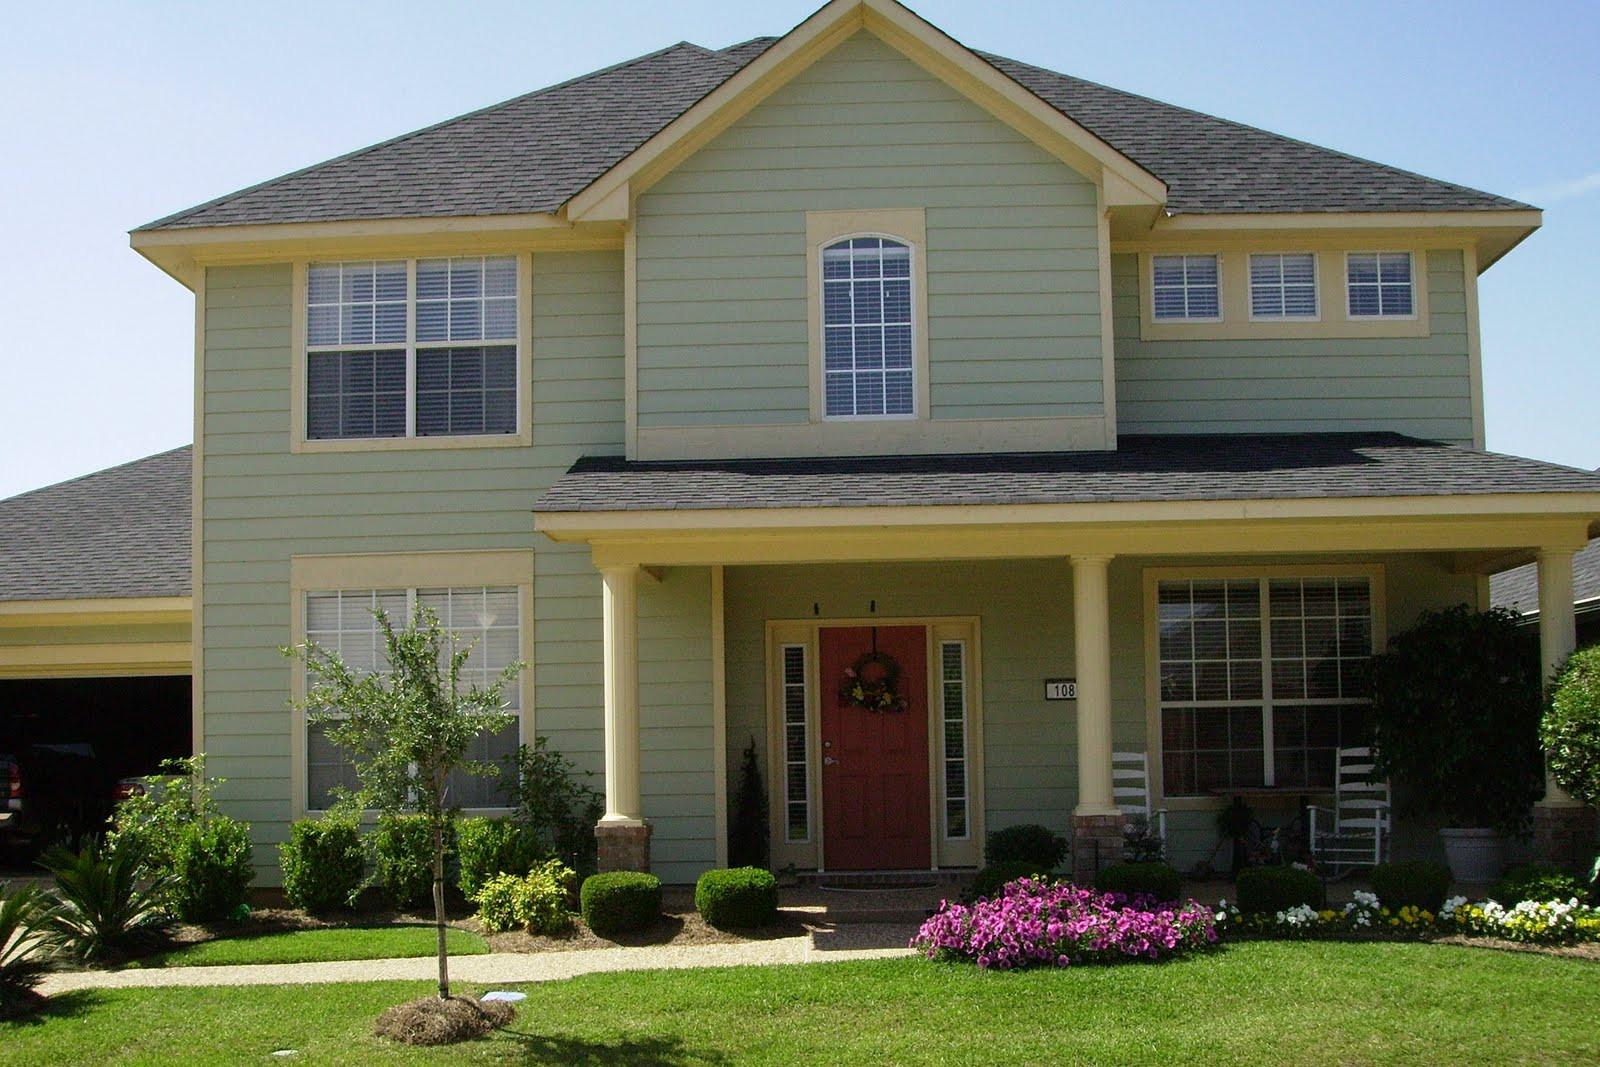 Best ideas about Home Depot Exterior Paint Colors . Save or Pin Home Depot Exterior Paint Colors Now.